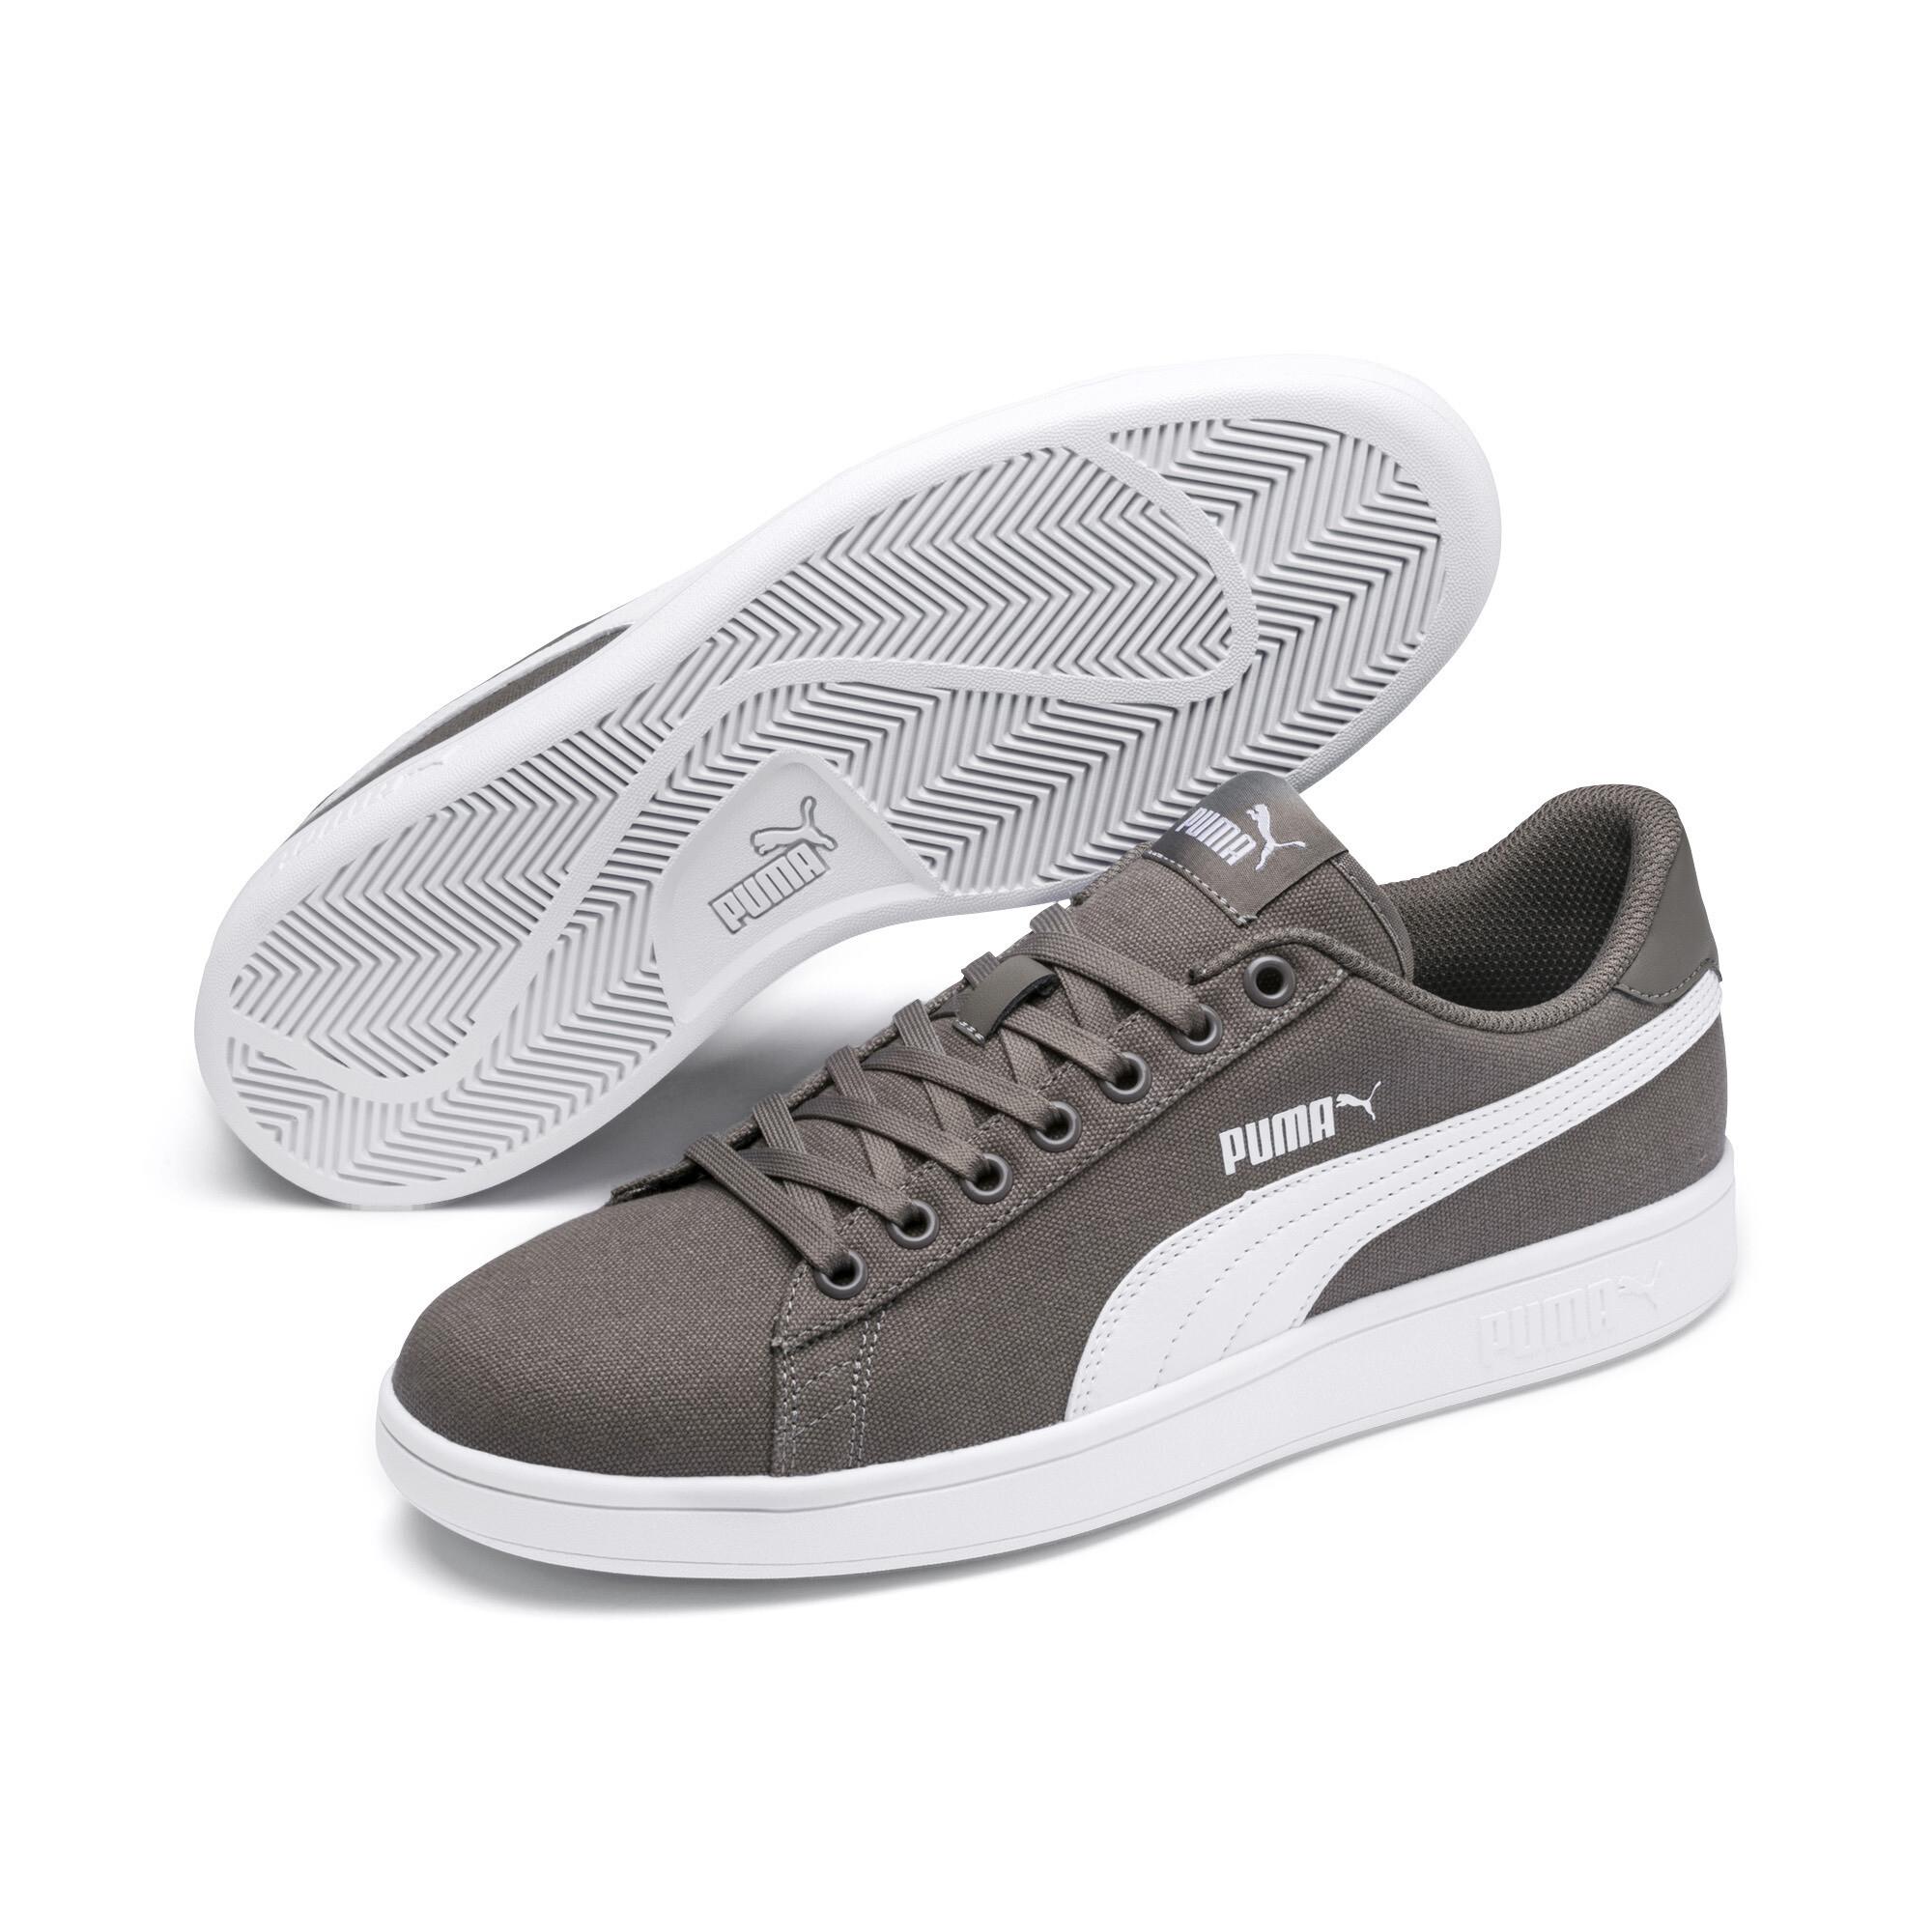 c7fee37a55 Details about PUMA PUMA Smash v2 Canvas Sneakers Men Shoe Basics. The Official  PUMA eBay Store ...